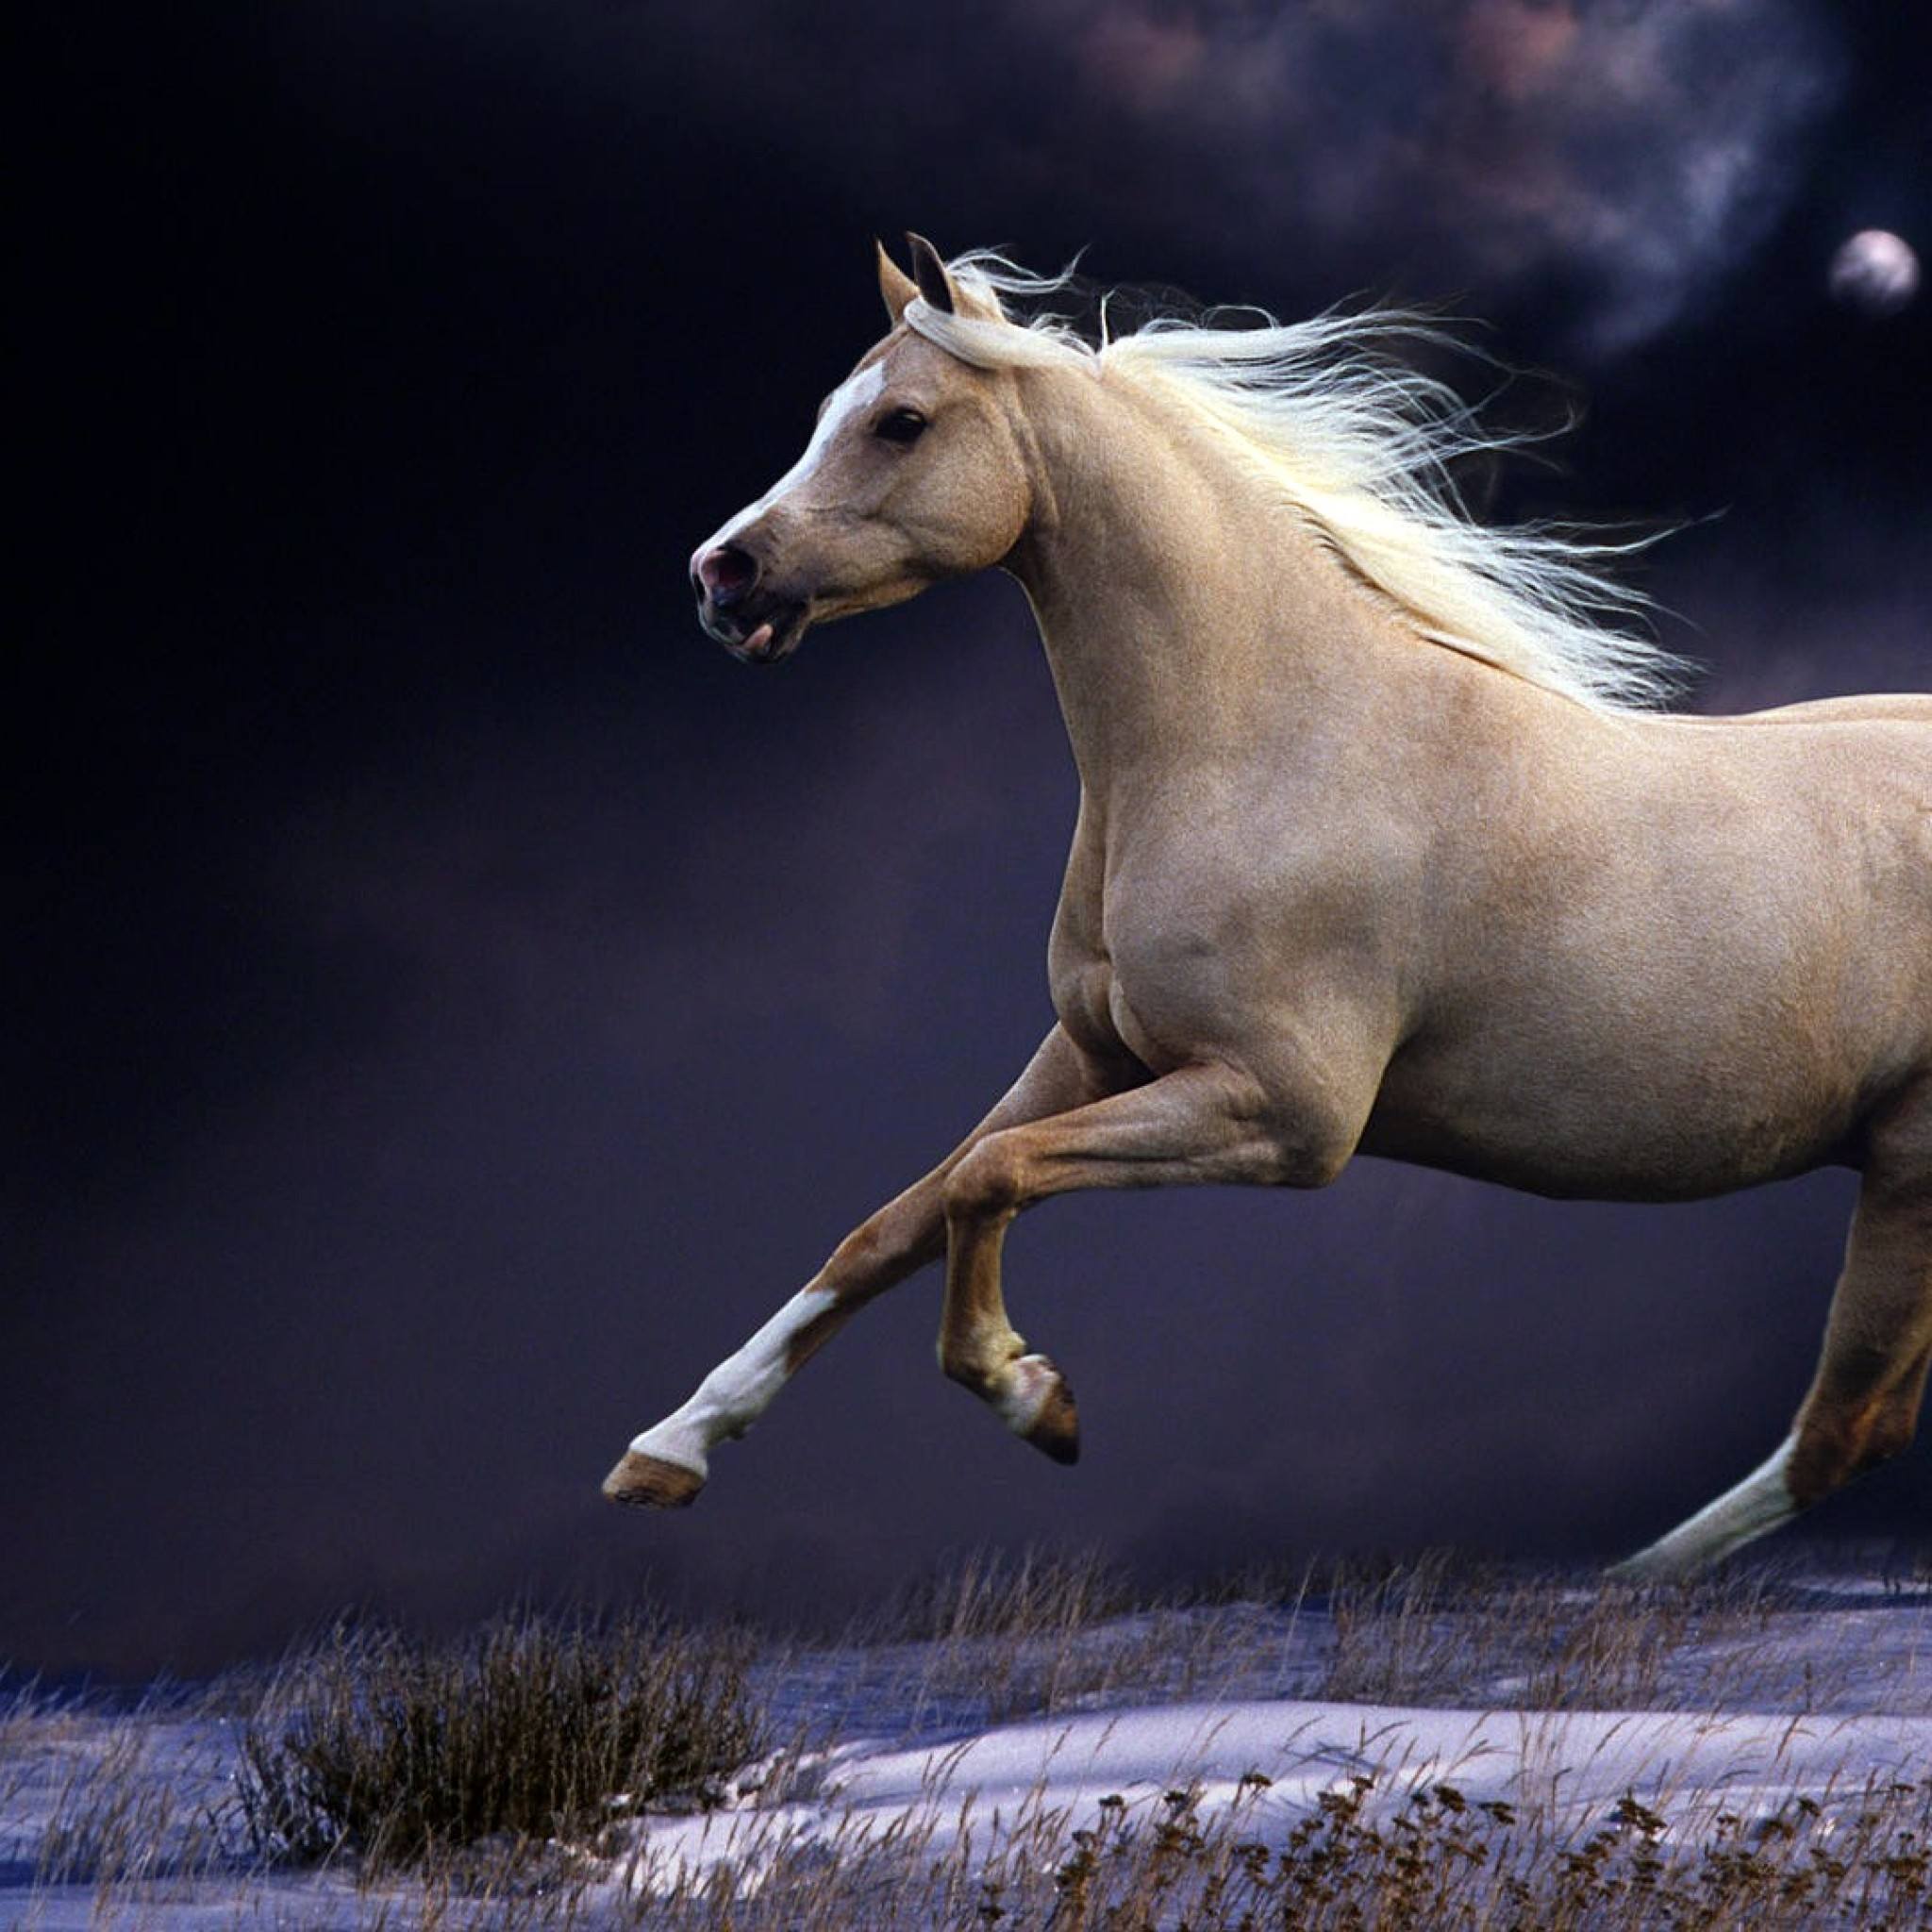 Wallpaper horse, mane, running, beautiful, night, sky